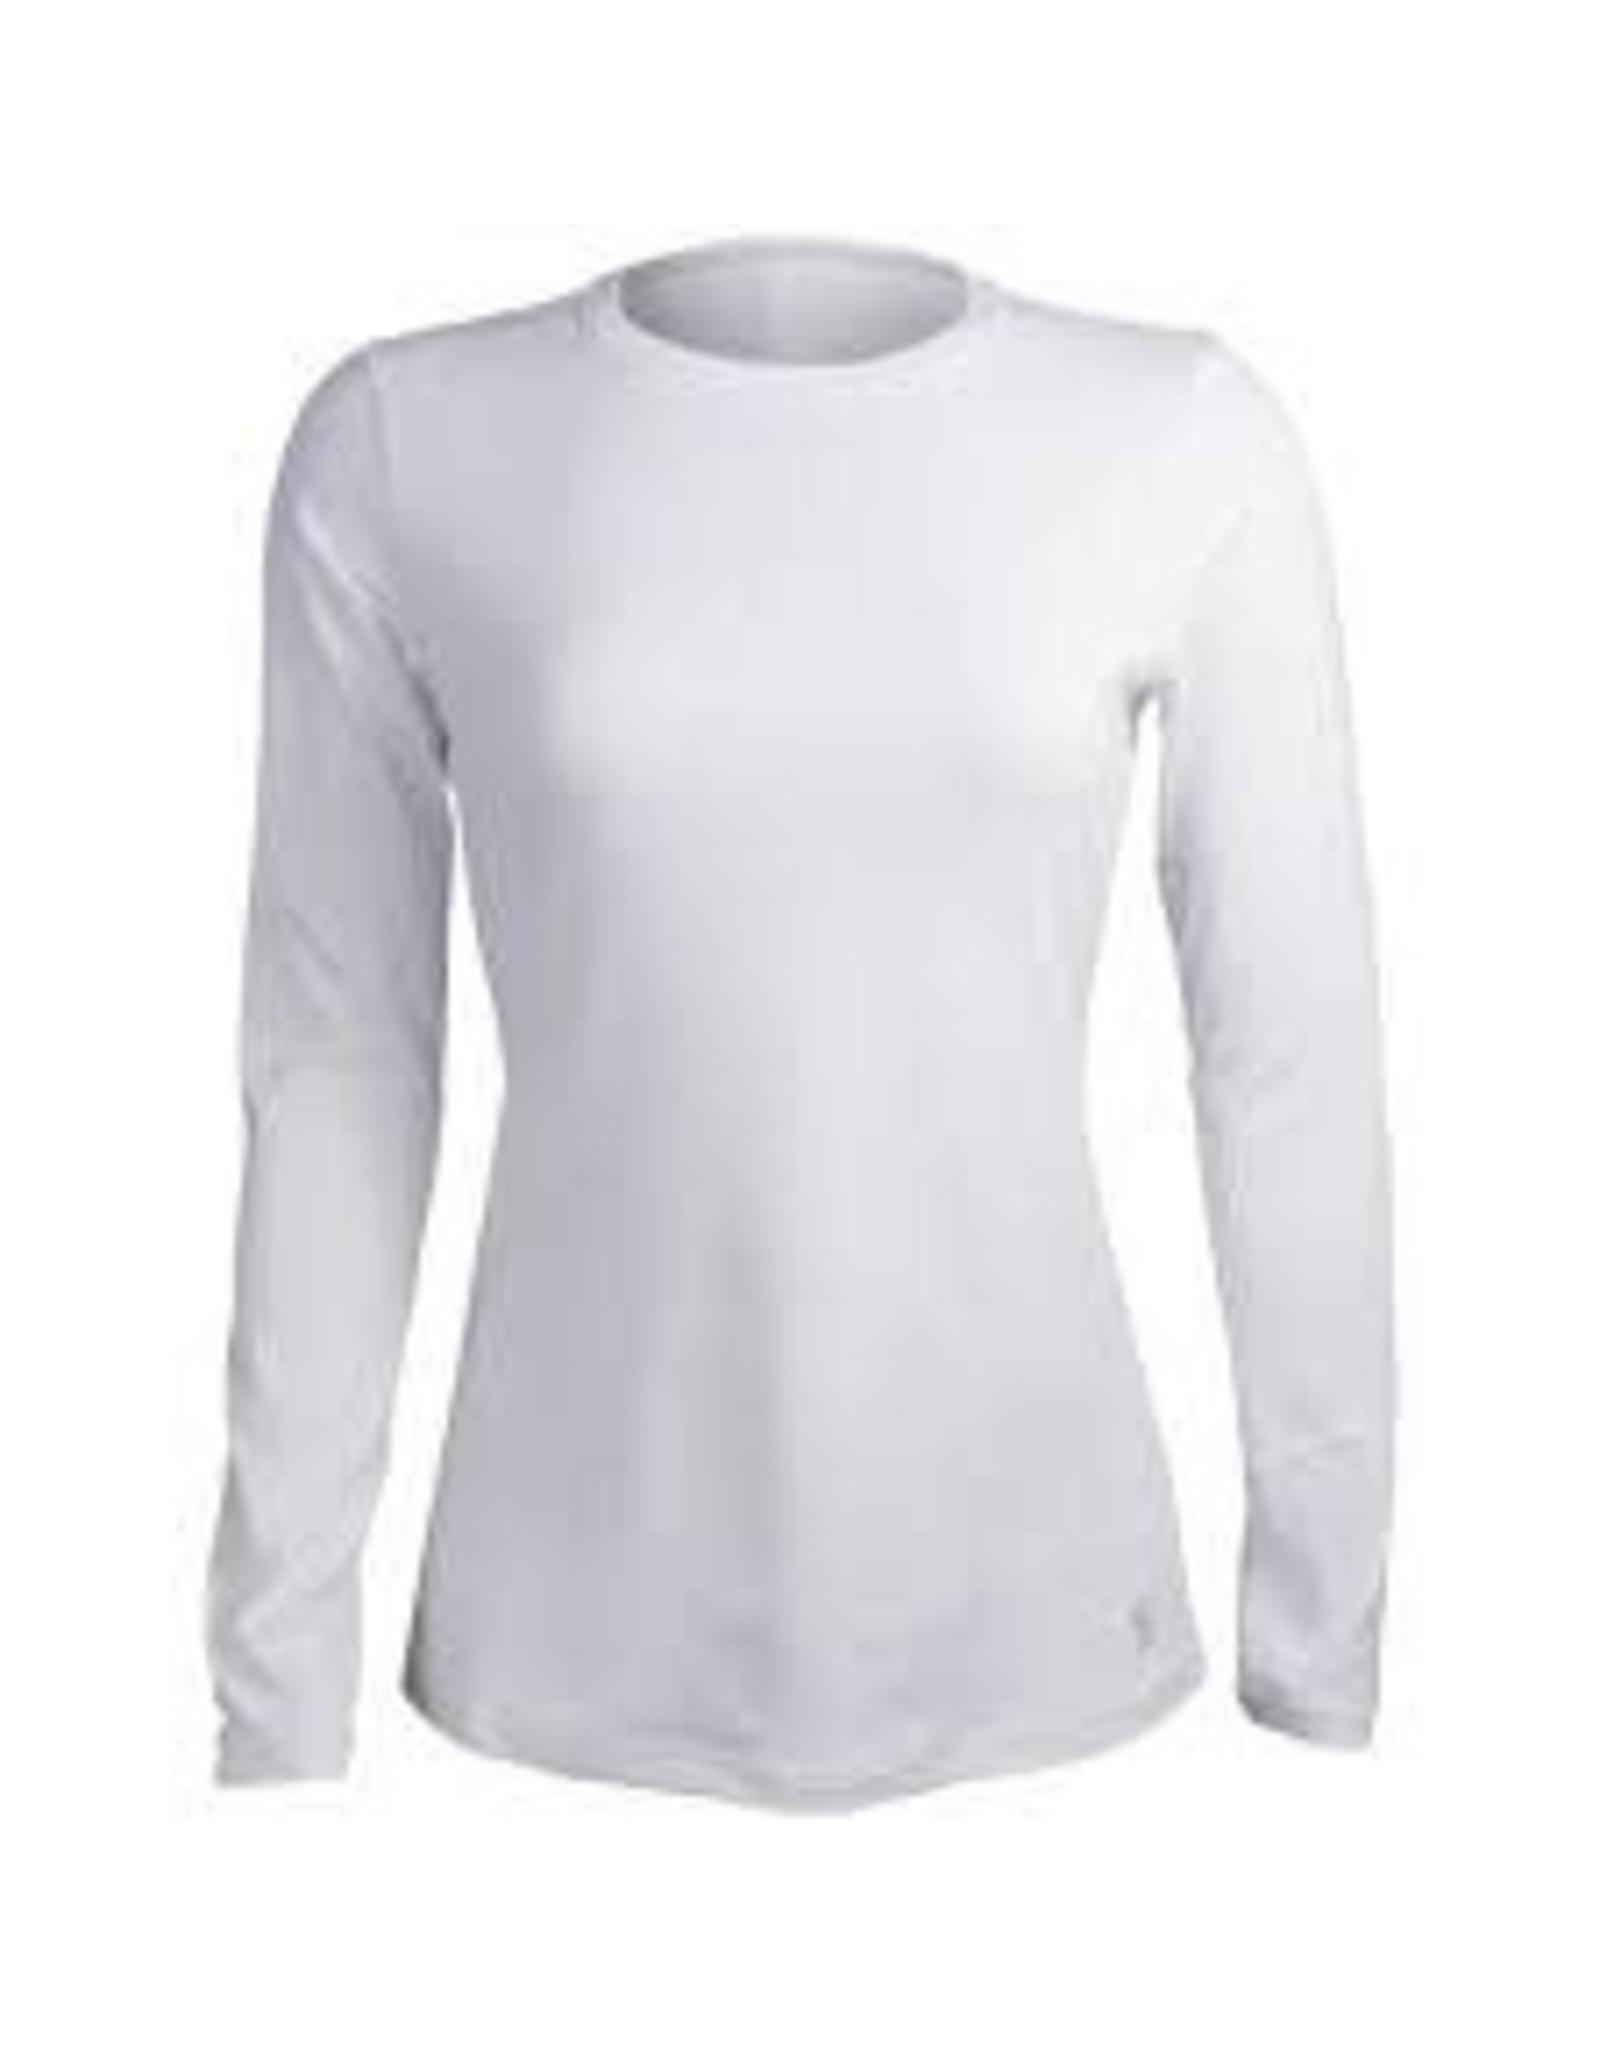 Sofibella UV Colors Long Sleeve Top